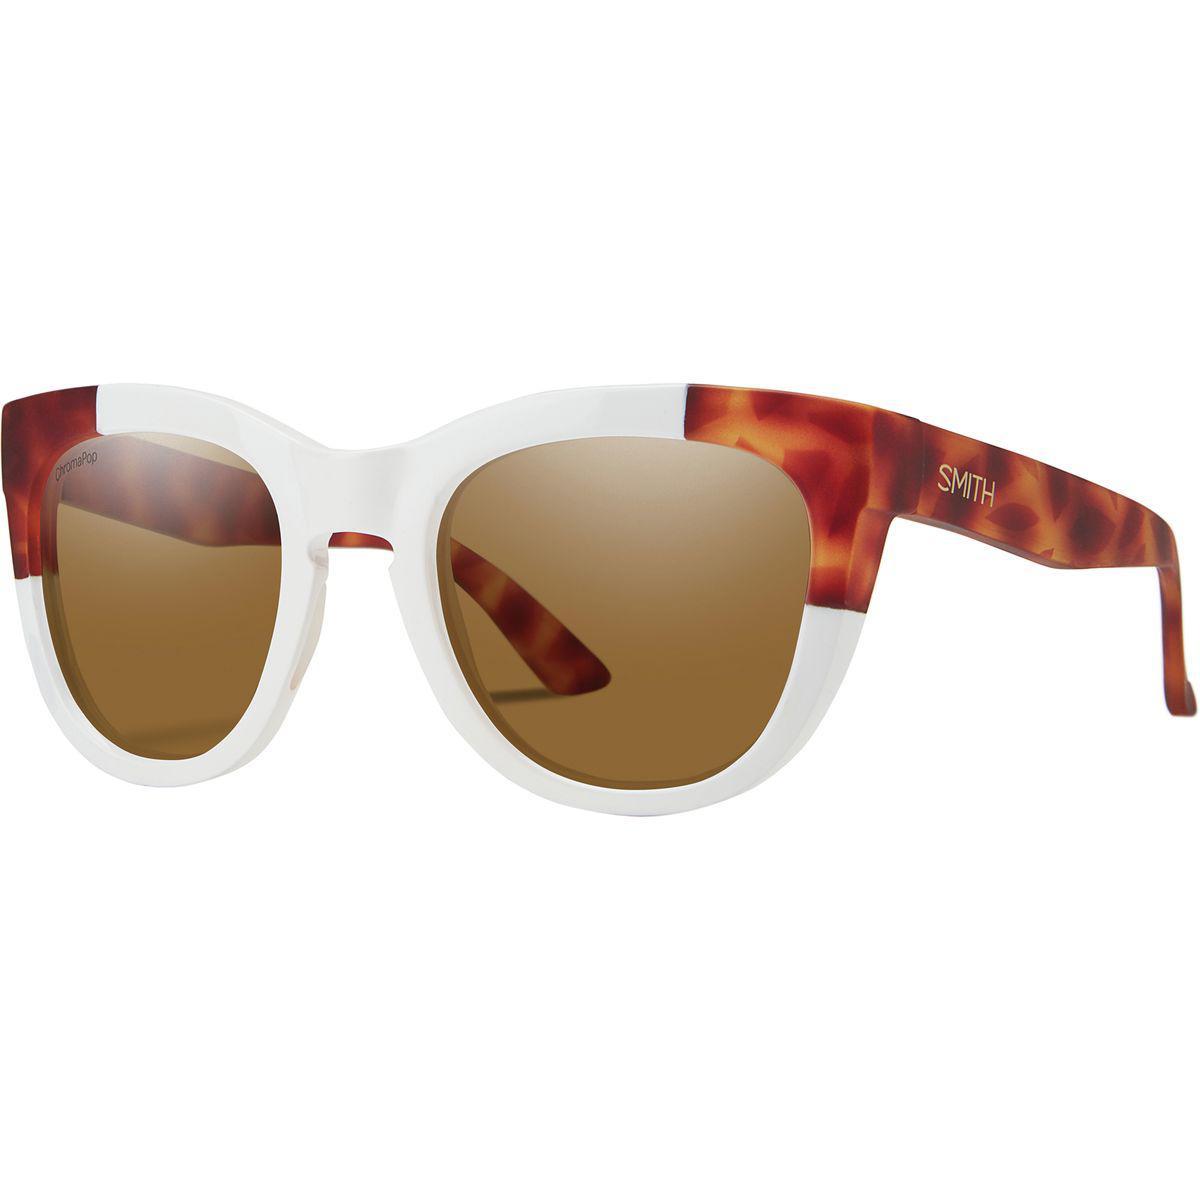 c82a3fde801d6 Lyst - Smith Sidney Chromapop Polarized Sunglasses in Brown